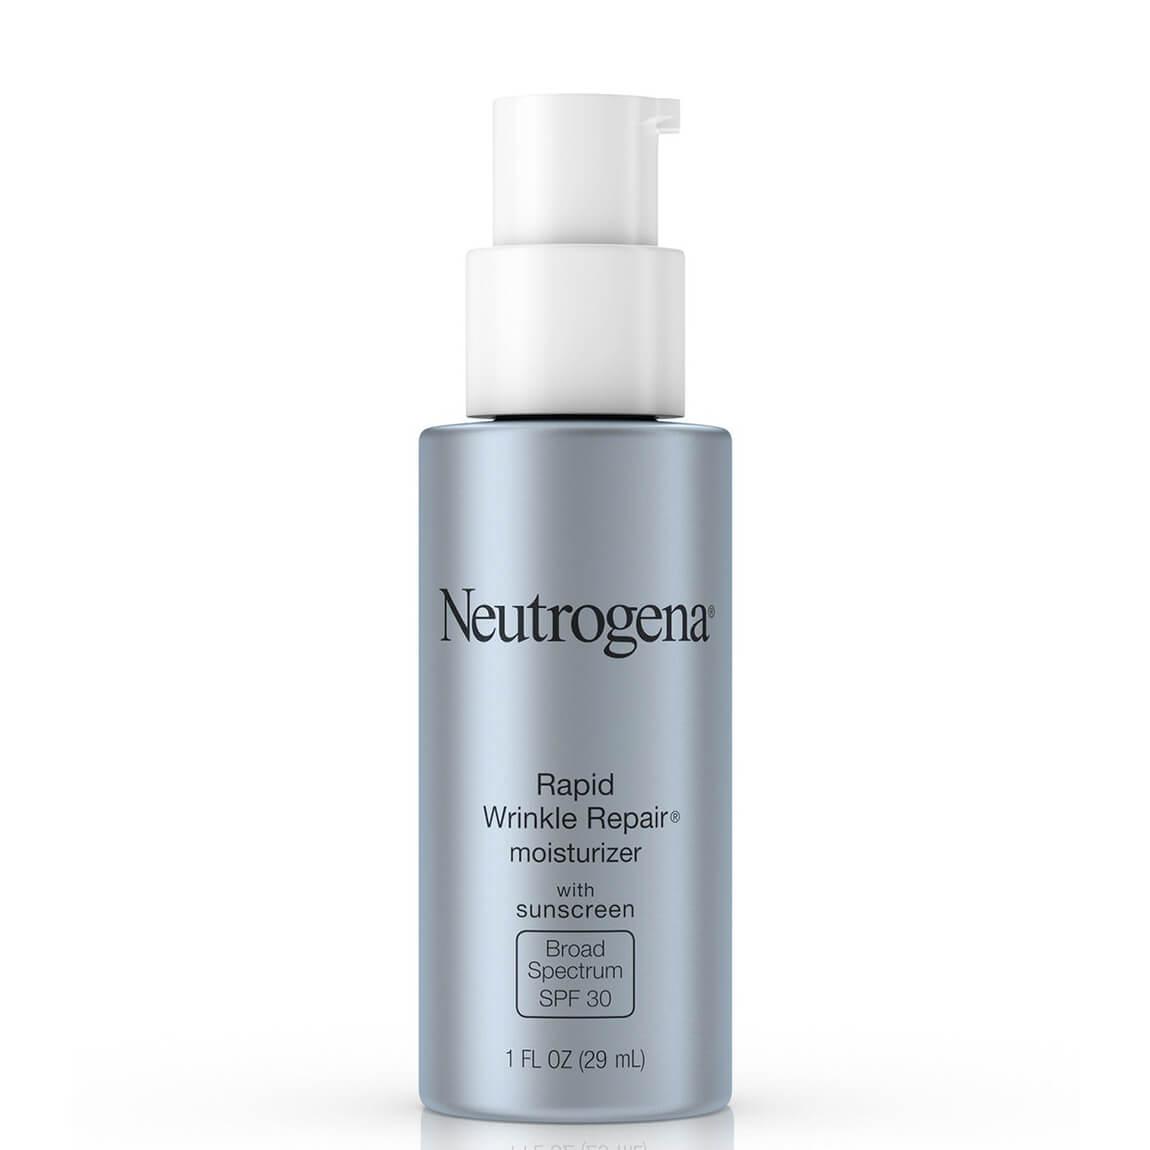 Neutrogena Rapid Wrinkle Repair Moisturizer with SPF 30